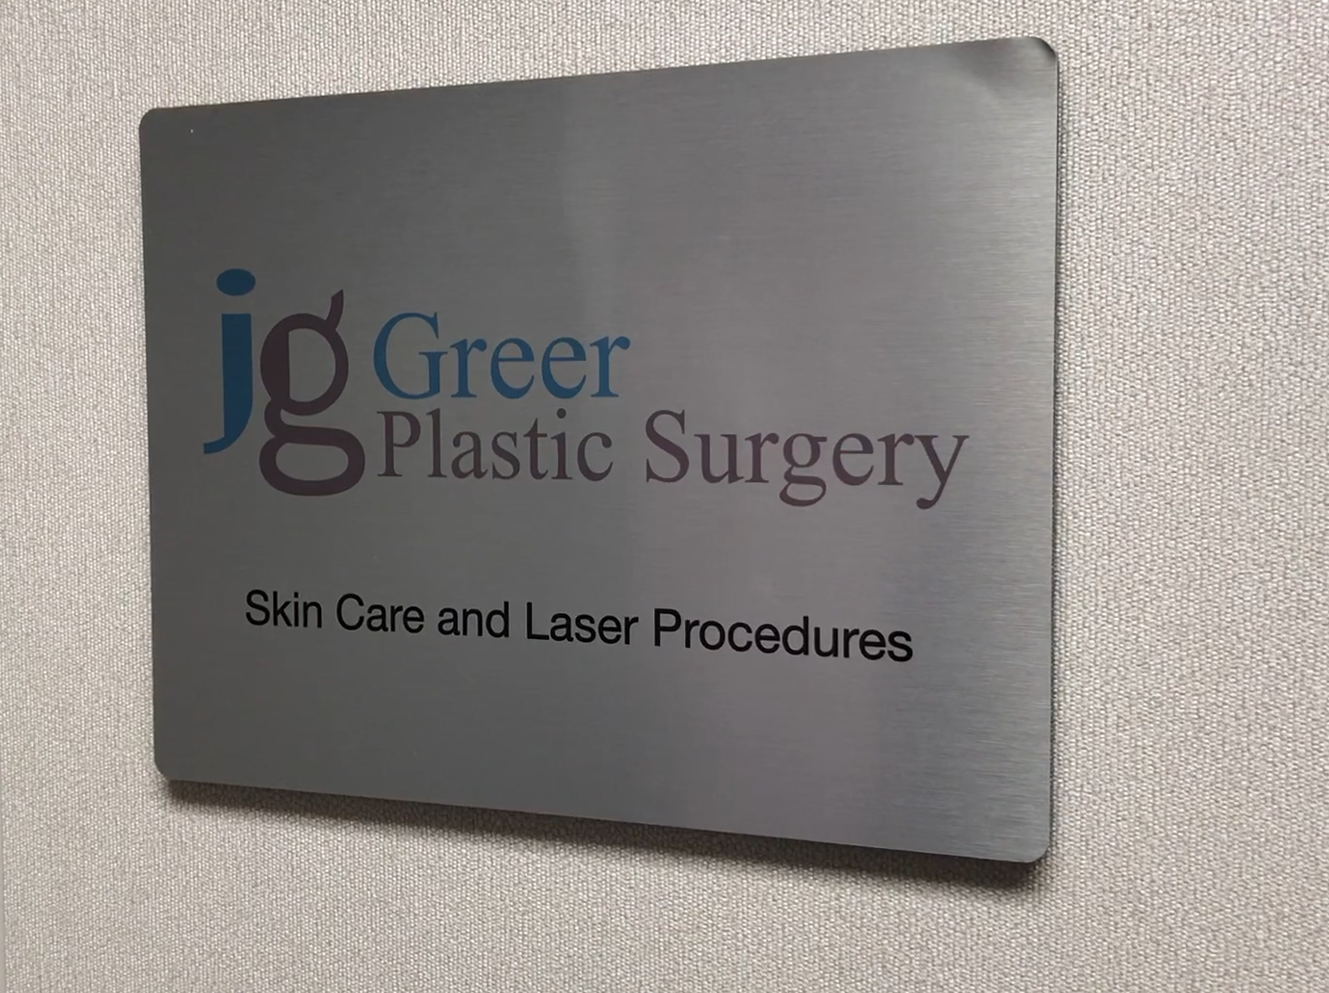 Greer Plastic Surgery image 1